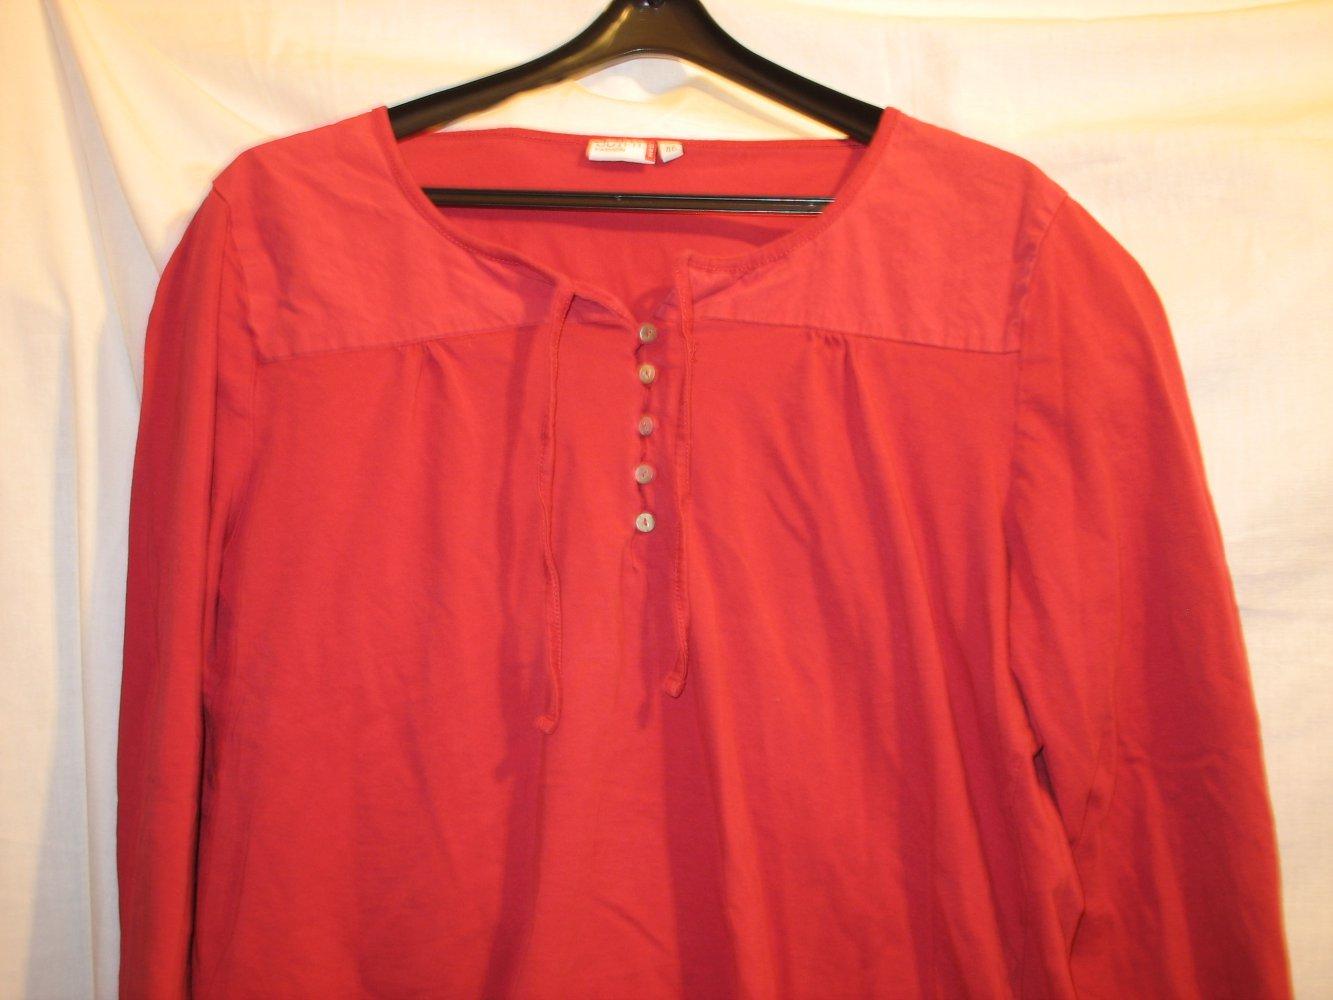 fd9e662f6706 NKD - Damen Shirt Gr. 46    Kleiderkorb.de